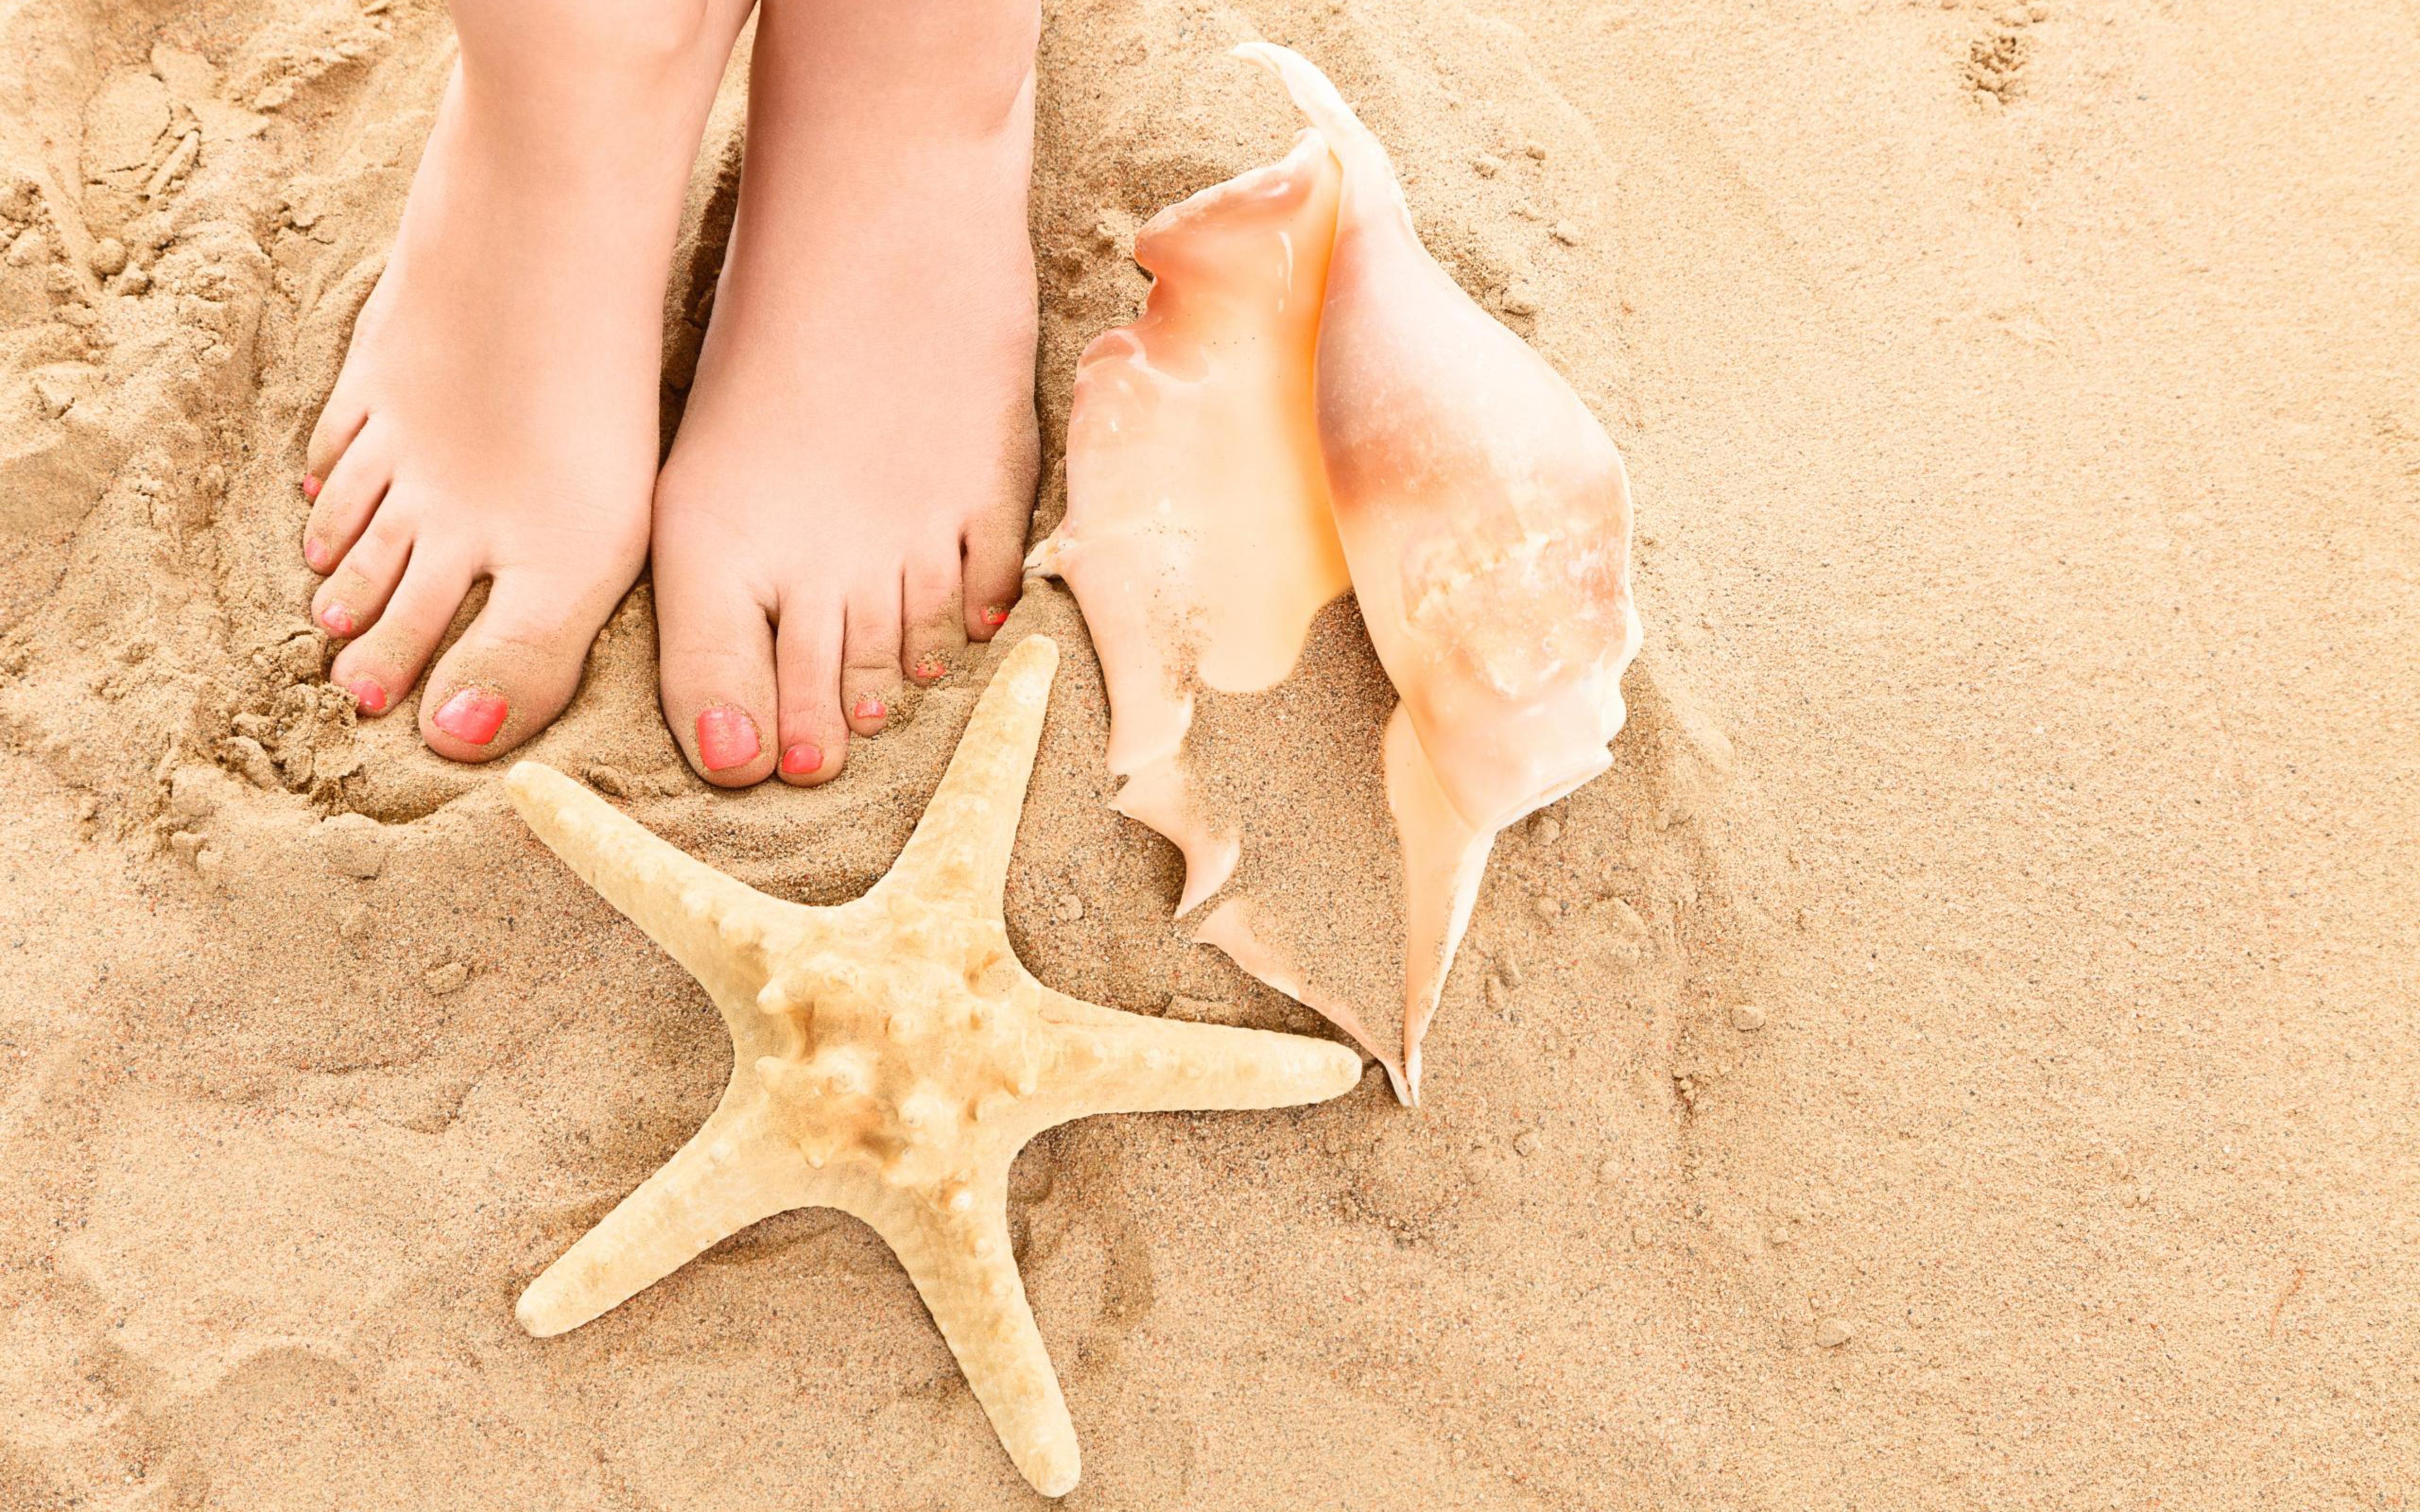 Sand and feet photo